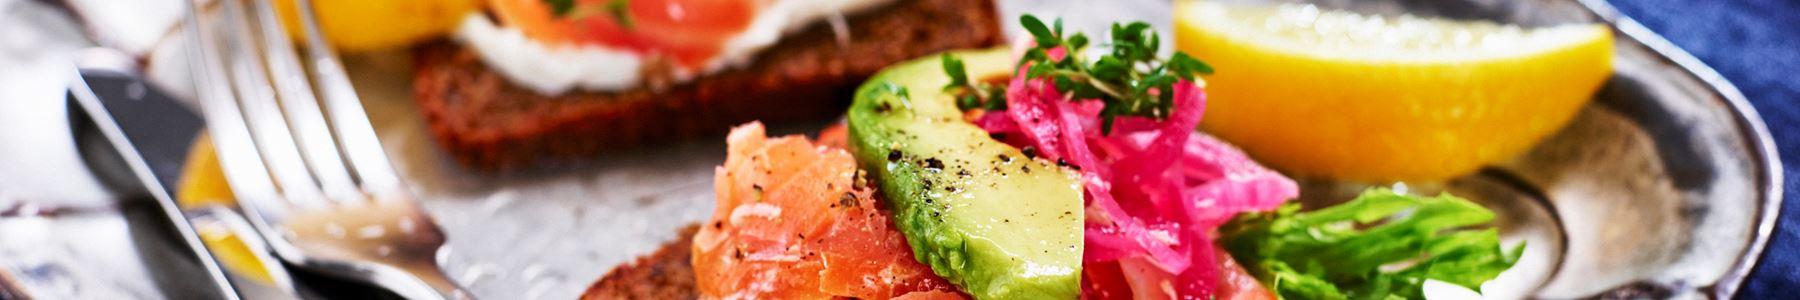 Avokado + Middag + Inlagd